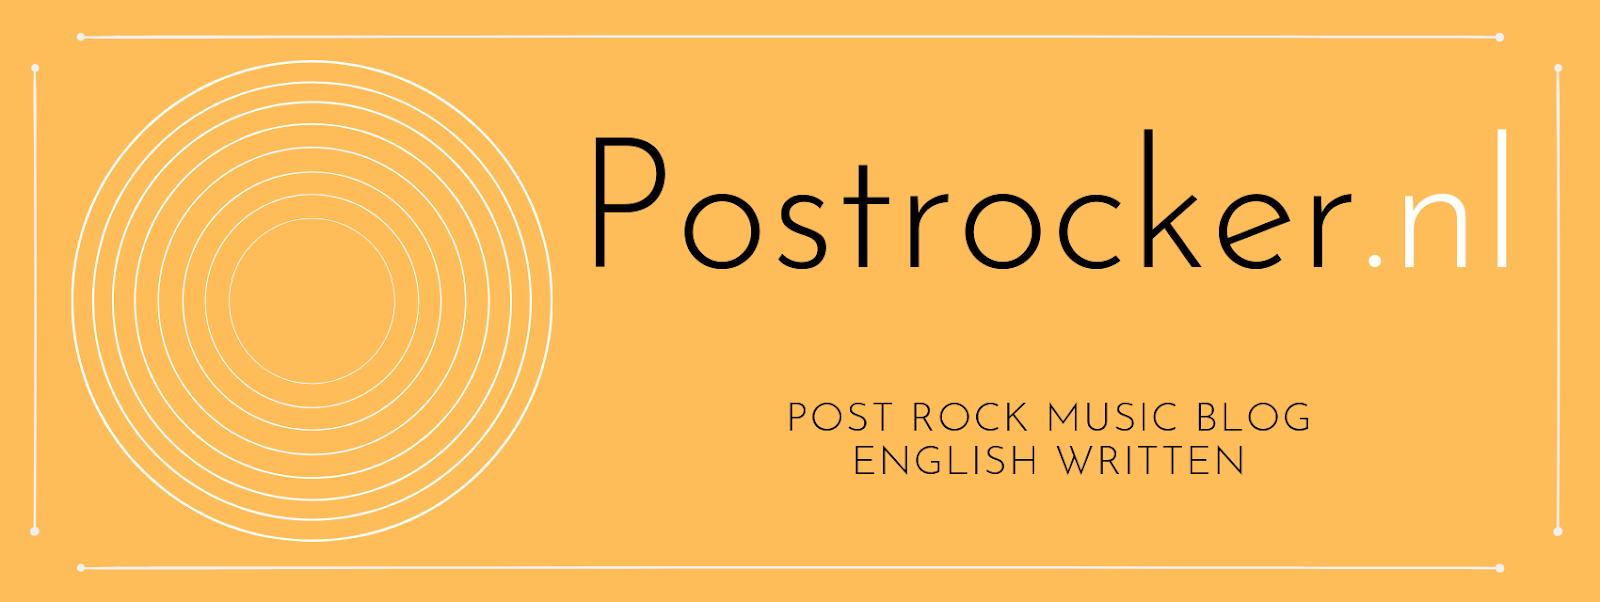 Postrocker.NL